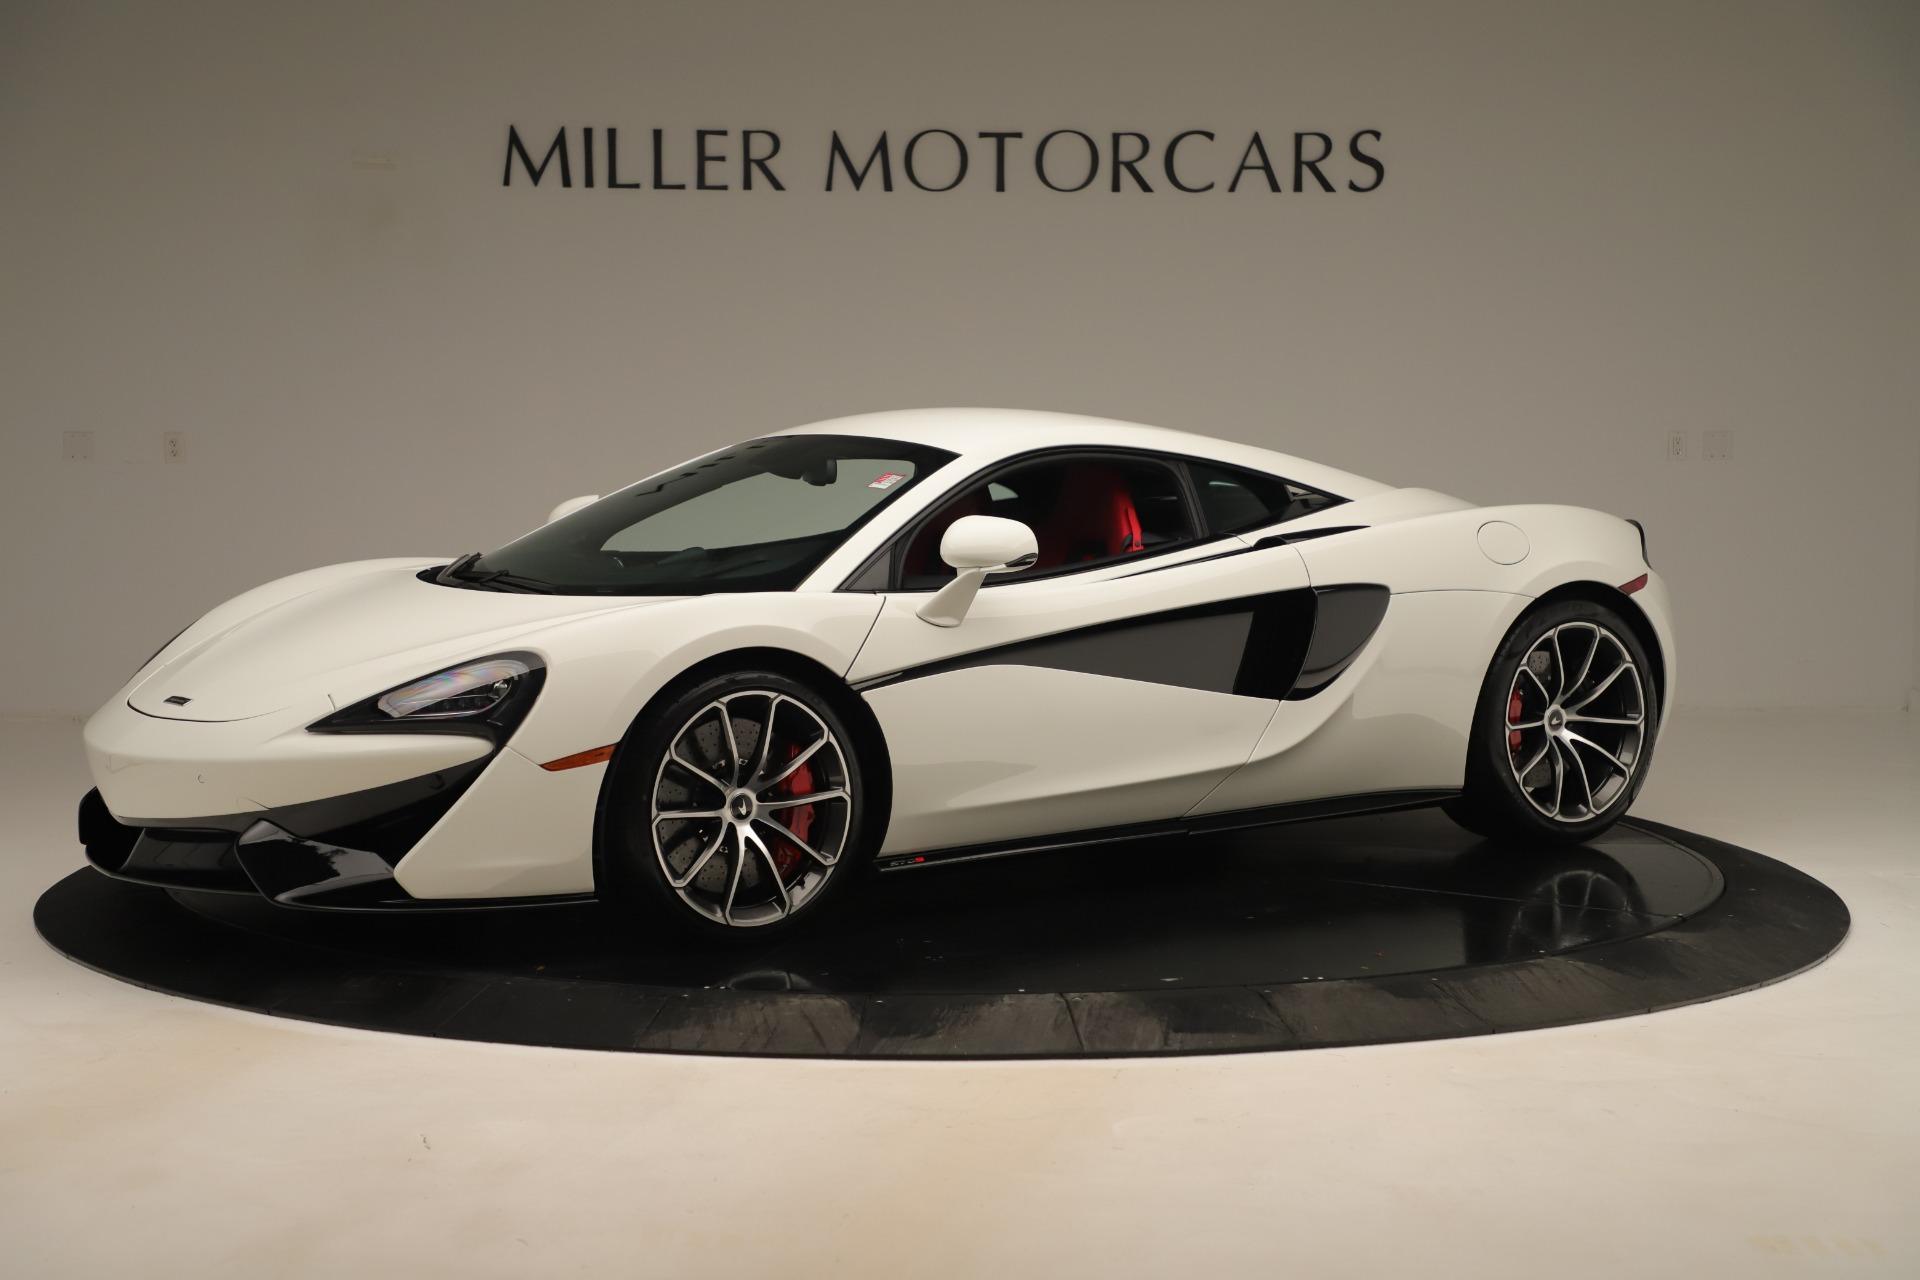 New 2020 McLaren 570S for sale $215,600 at McLaren Greenwich in Greenwich CT 06830 1